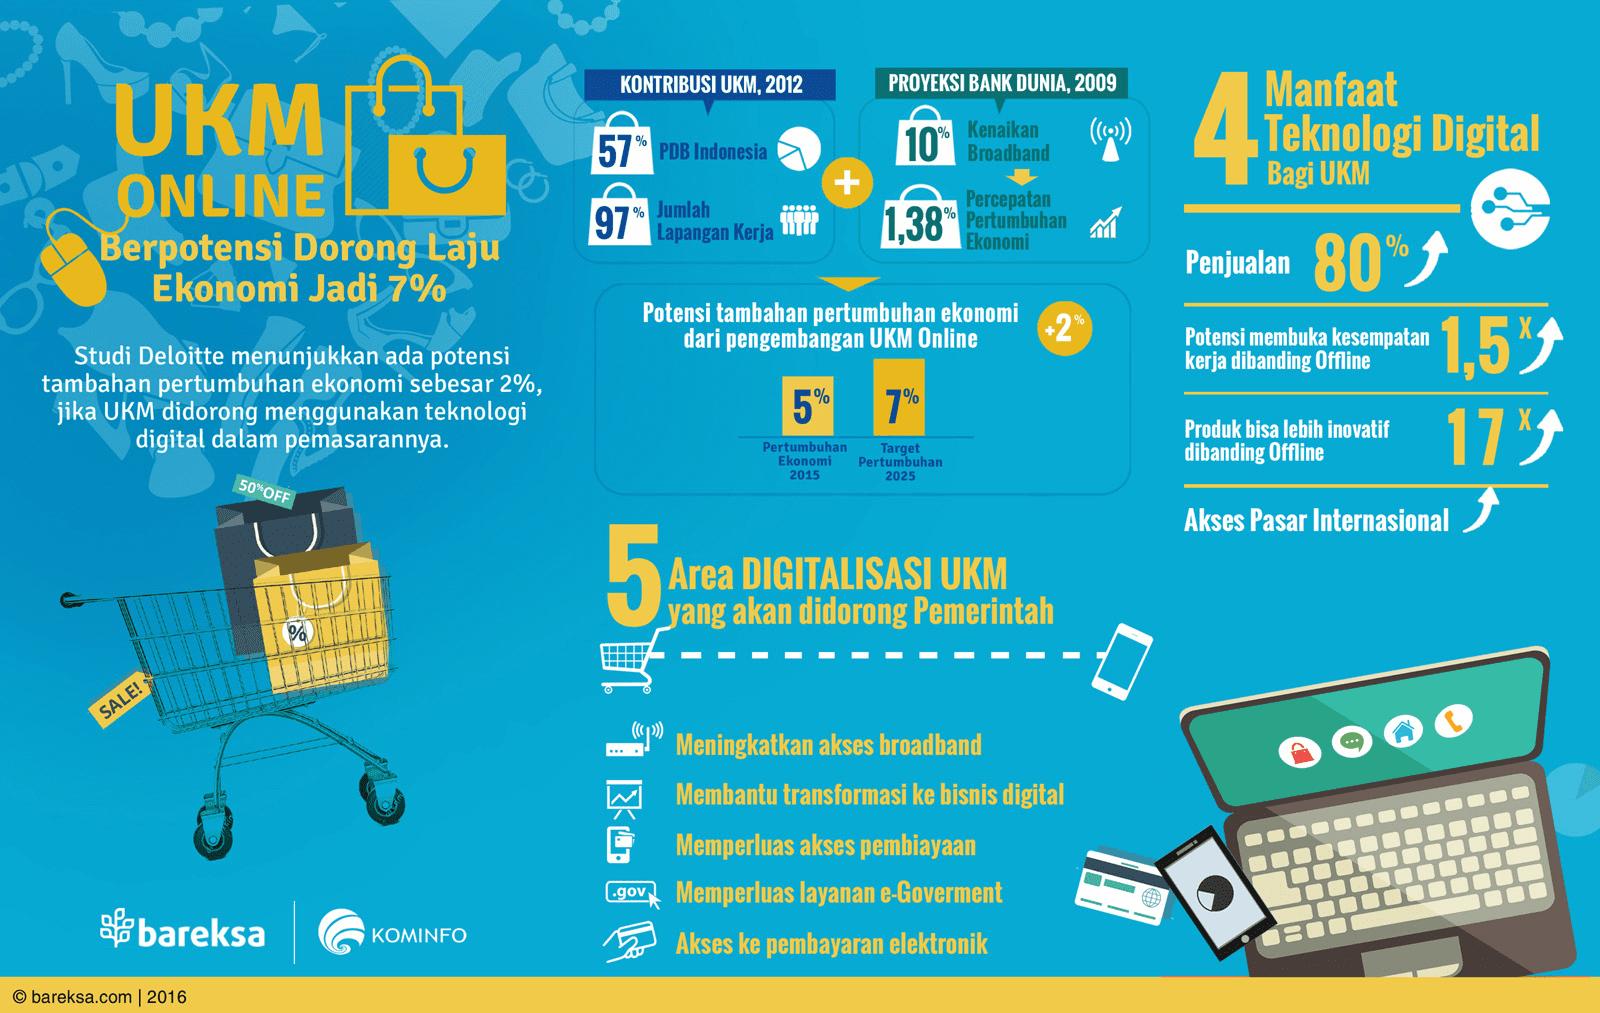 KUR untuk UKM Online di Indonesia (Infografis) UKM Online Berpotensi Dorong Laju Ekonomi Bareksa - Perencana Keuangan Independen Finansialku